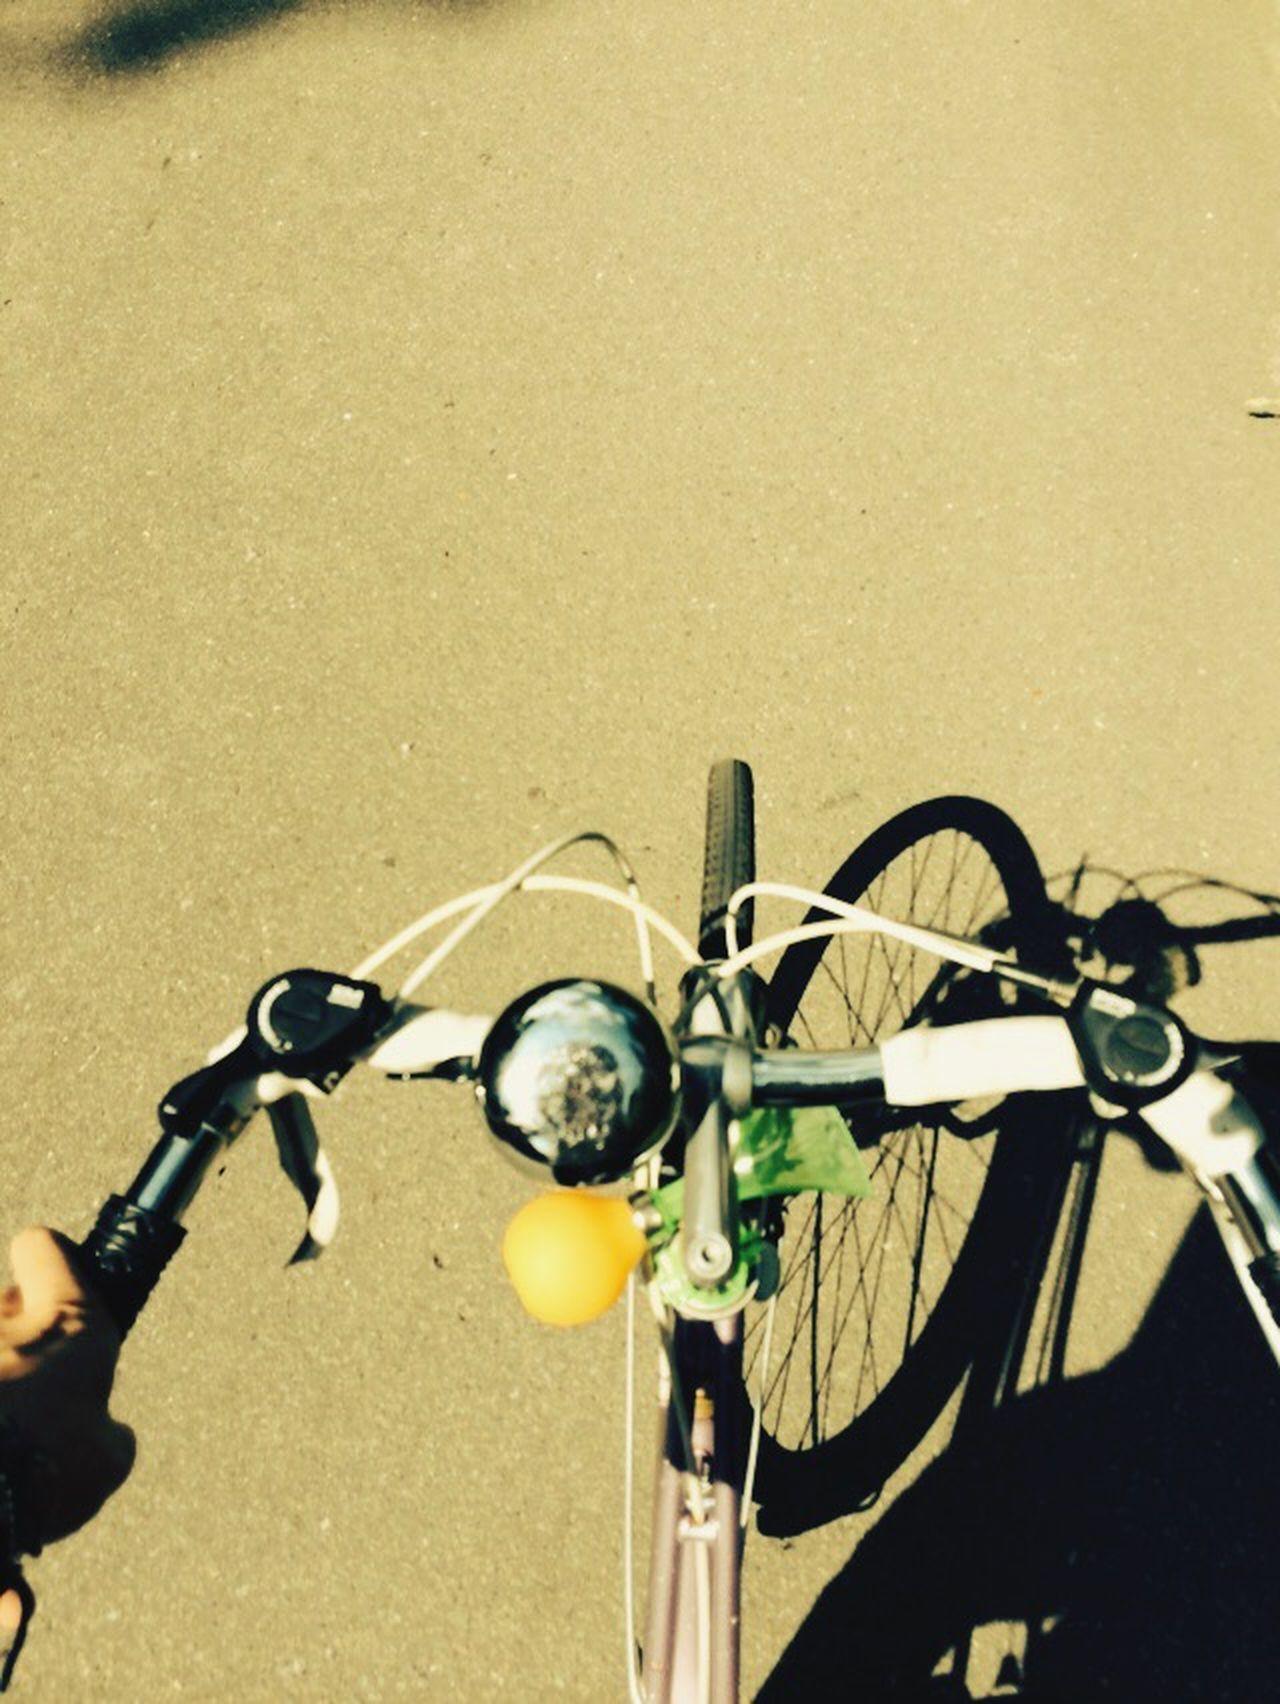 Capturing Freedom Teufelsberg Berlin Bike Trip Riding Bike Movement Random Colors Passion